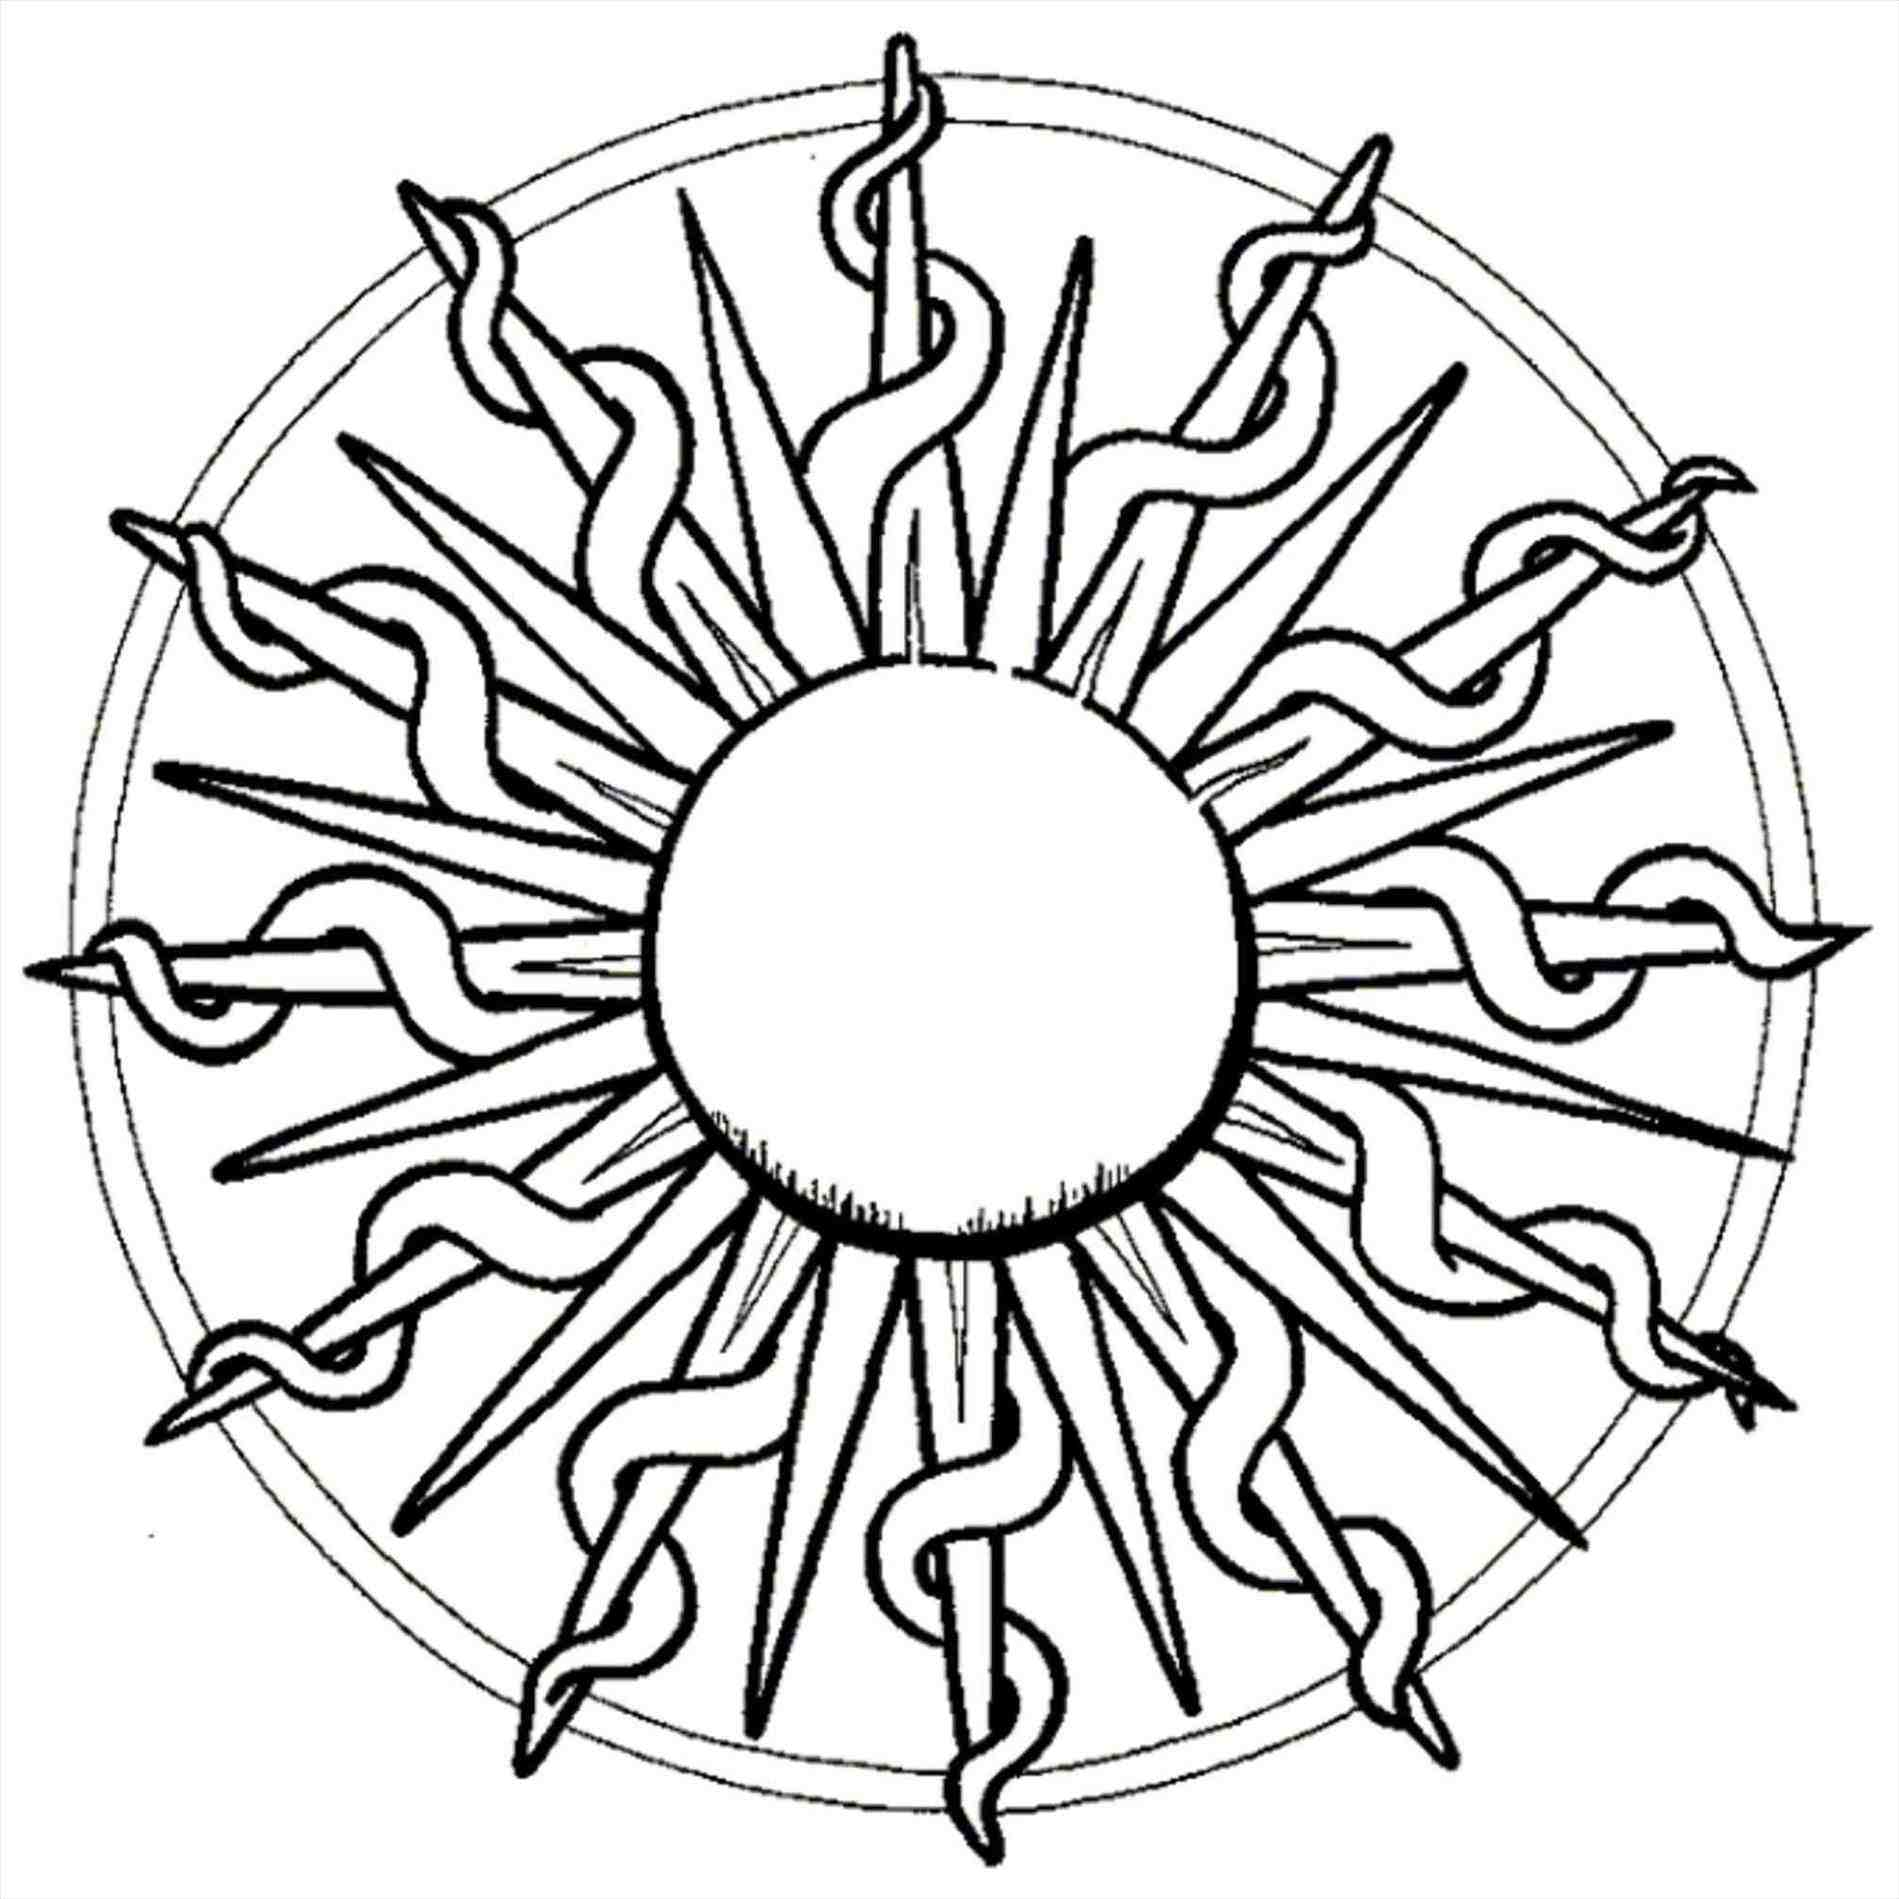 1899x1899 Sun Drawing Tumblr In Color